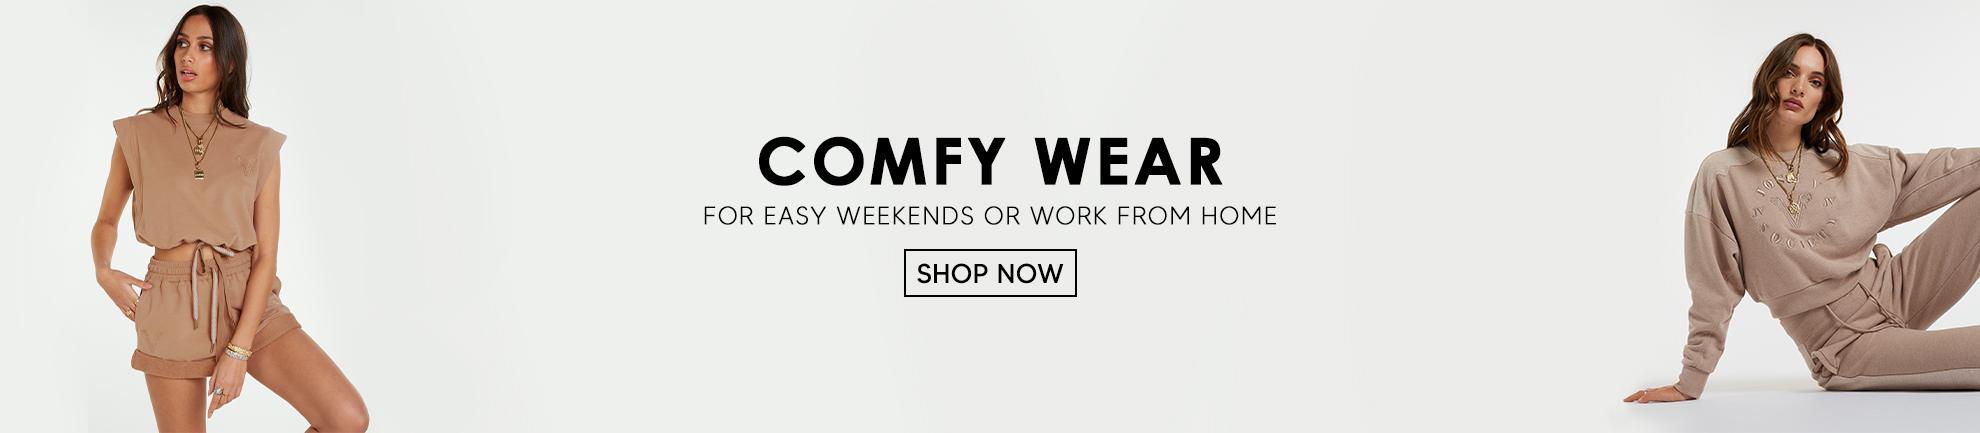 comfy wear JOSH V